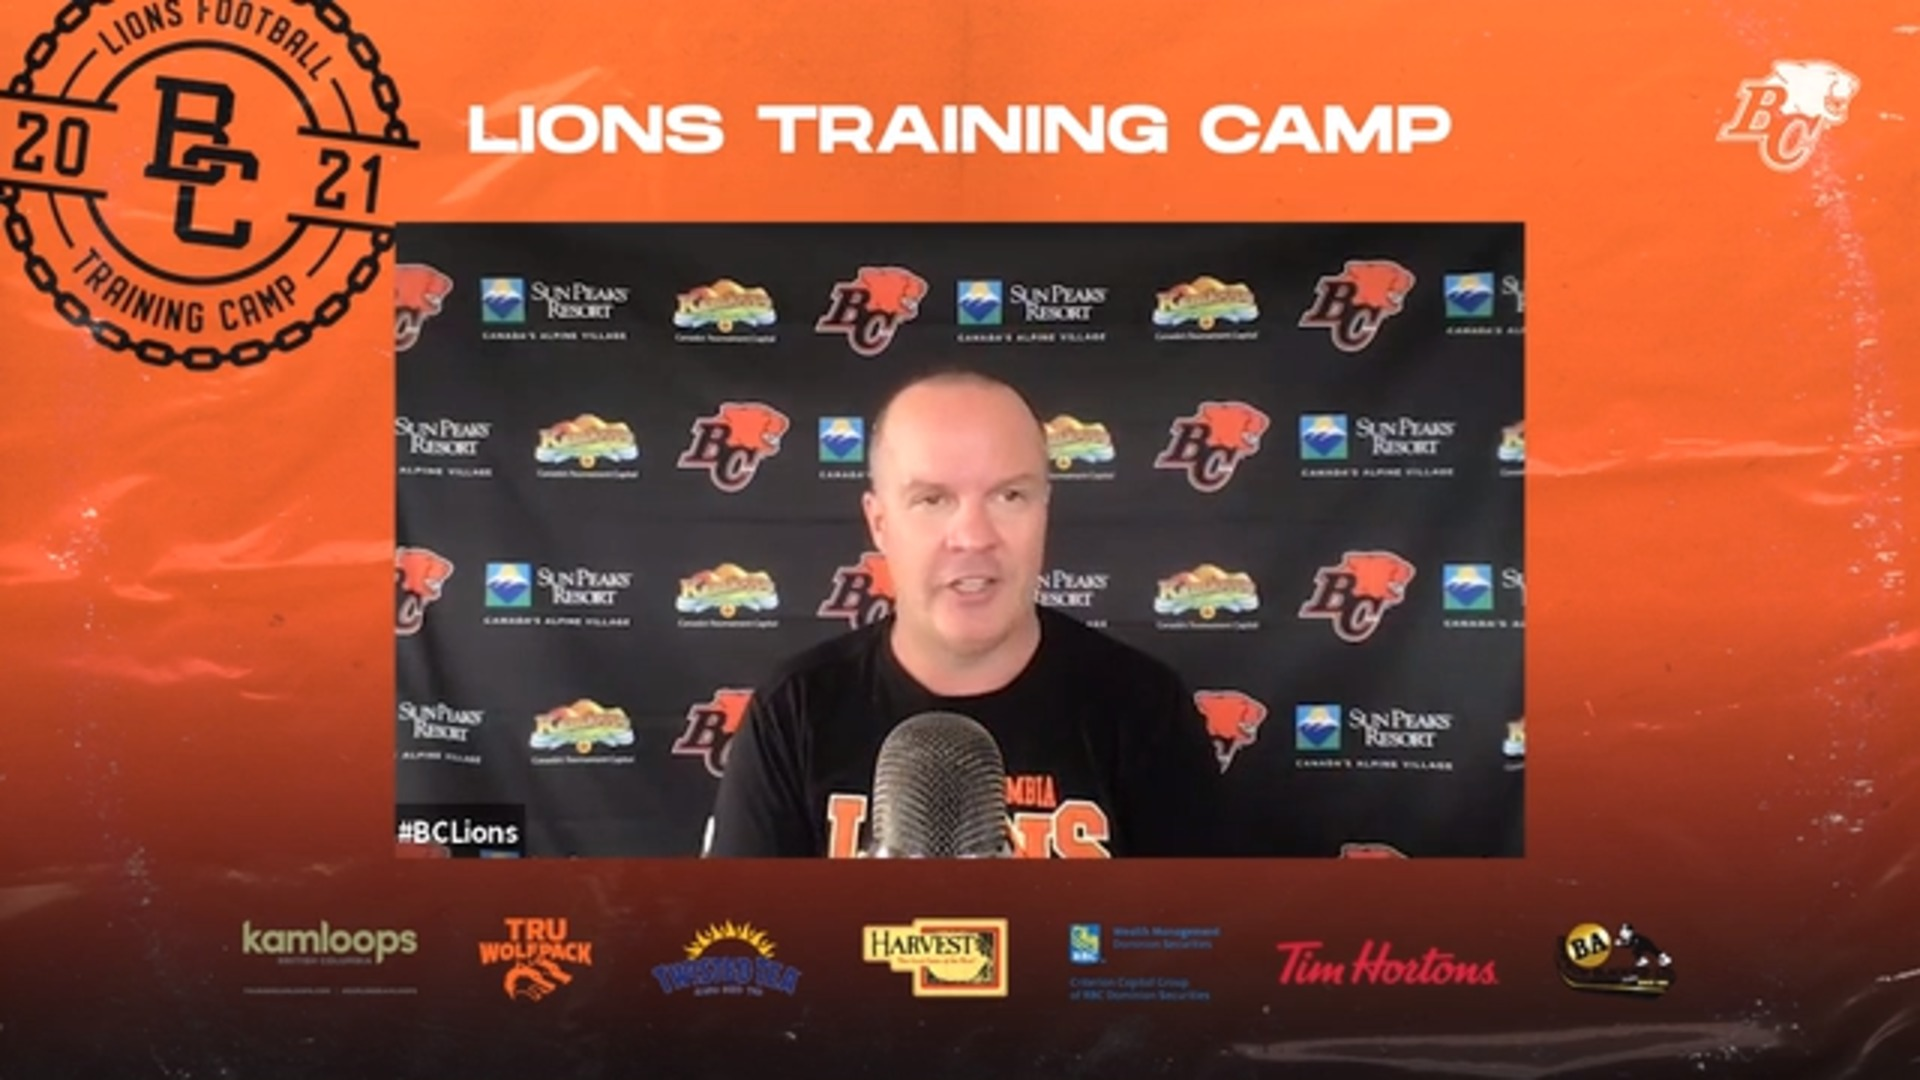 Training Camp July 19 | Rick Campbell